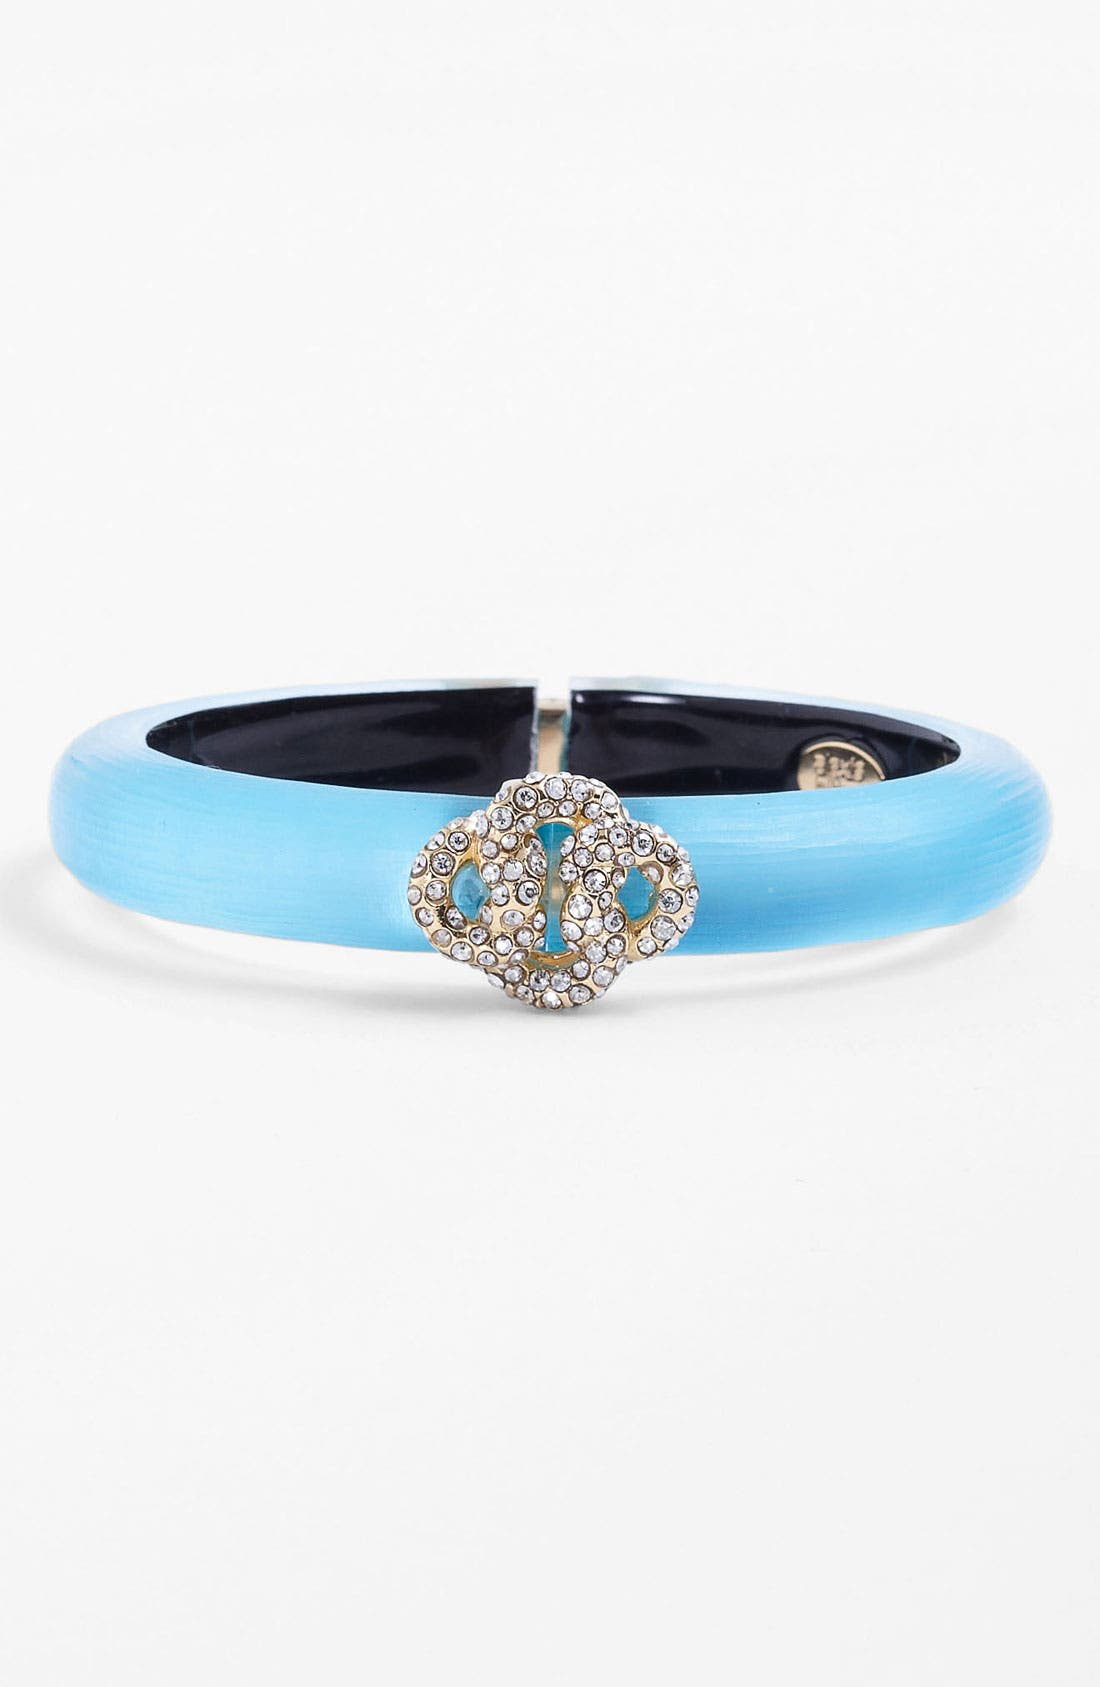 Main Image - Alexis Bittar 'Lucite® - Mod' Knot Bracelet (Nordstrom Exclusive)